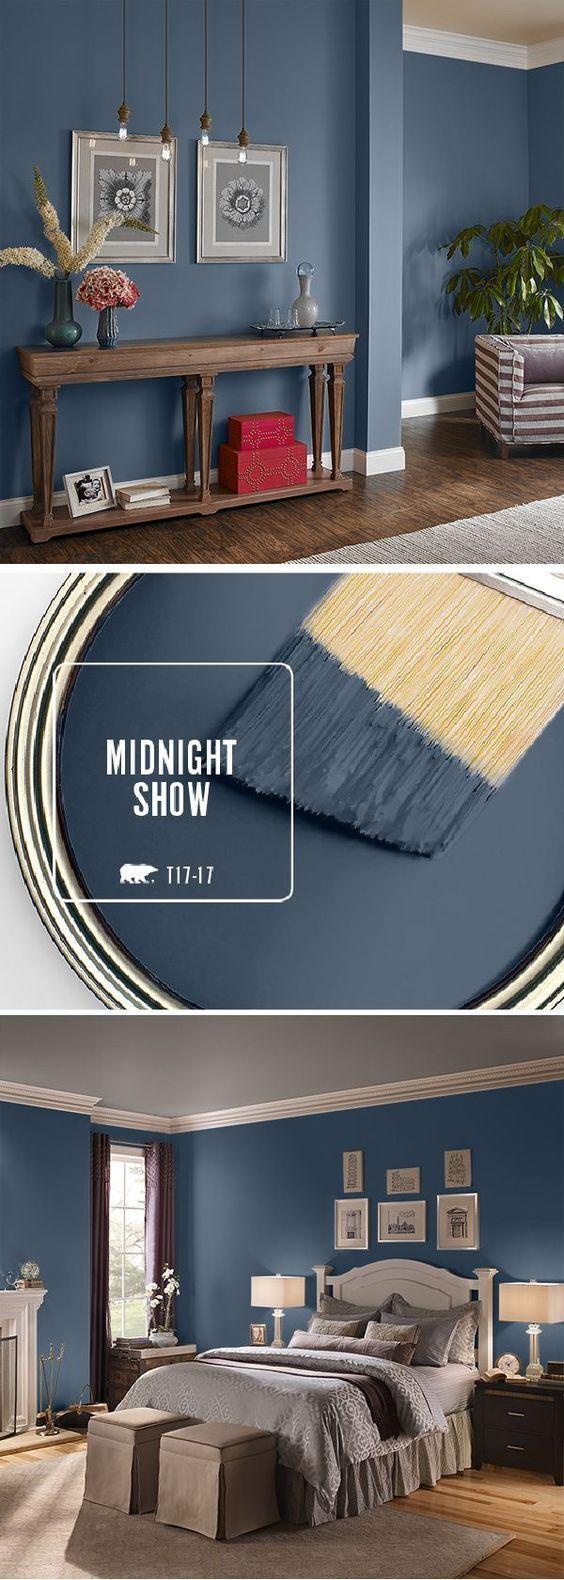 Best 25 European Home Decor Ideas On Pinterest Home